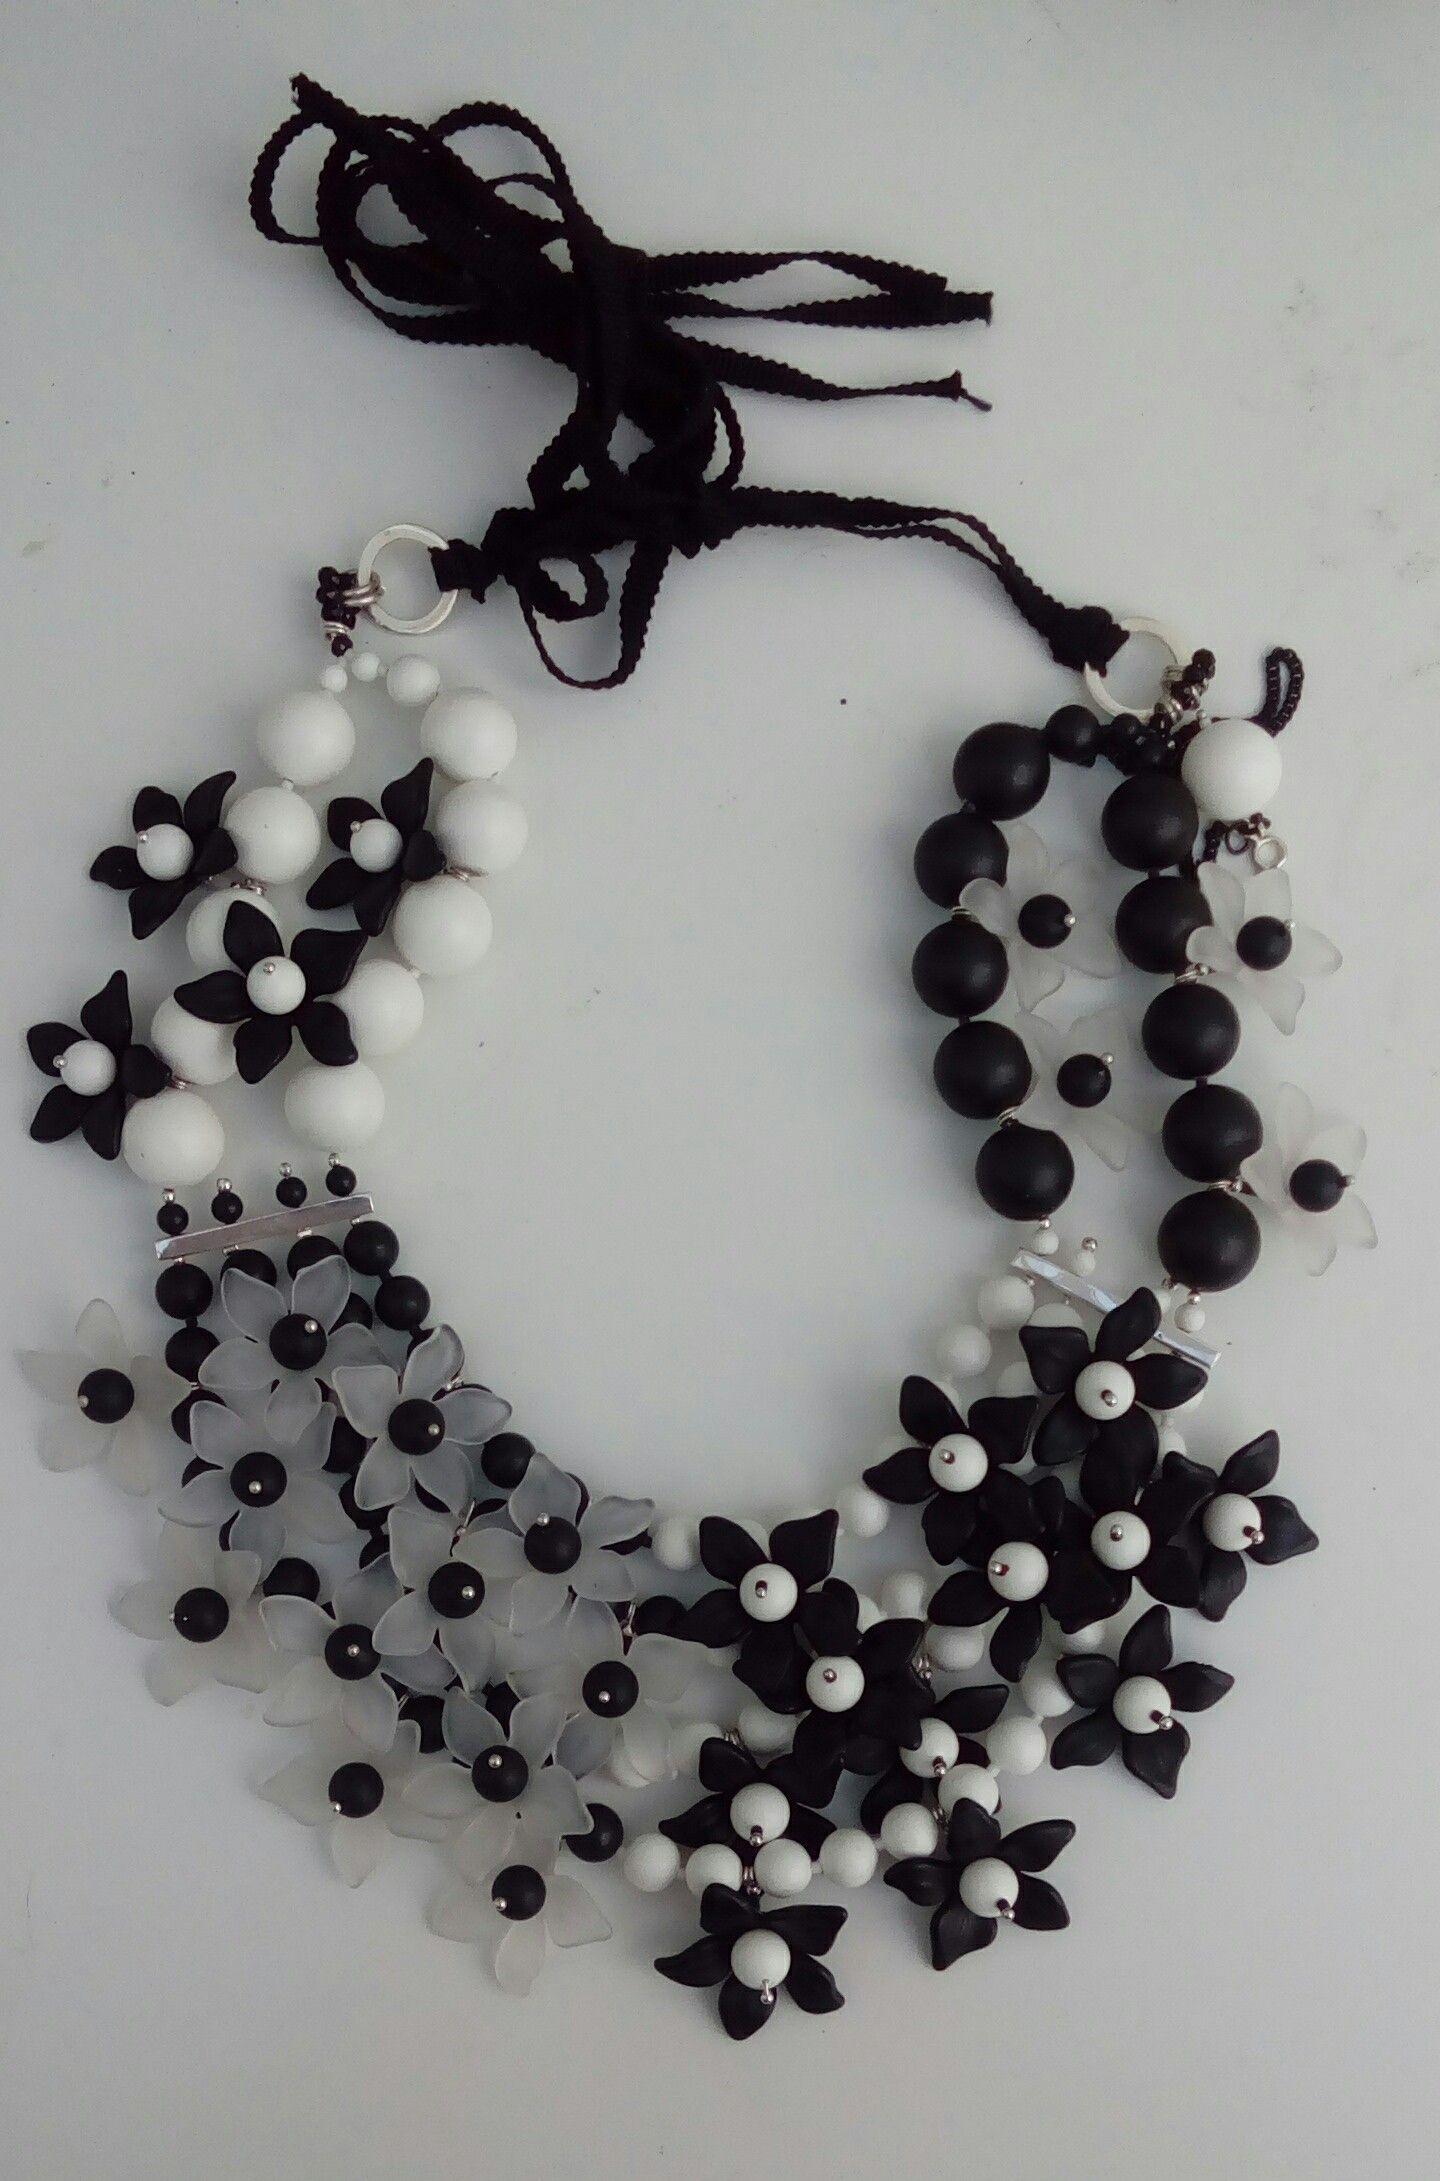 Black & White Floral Neckpiece #AW15 #StudioPic #Flowers #MelissaCurry